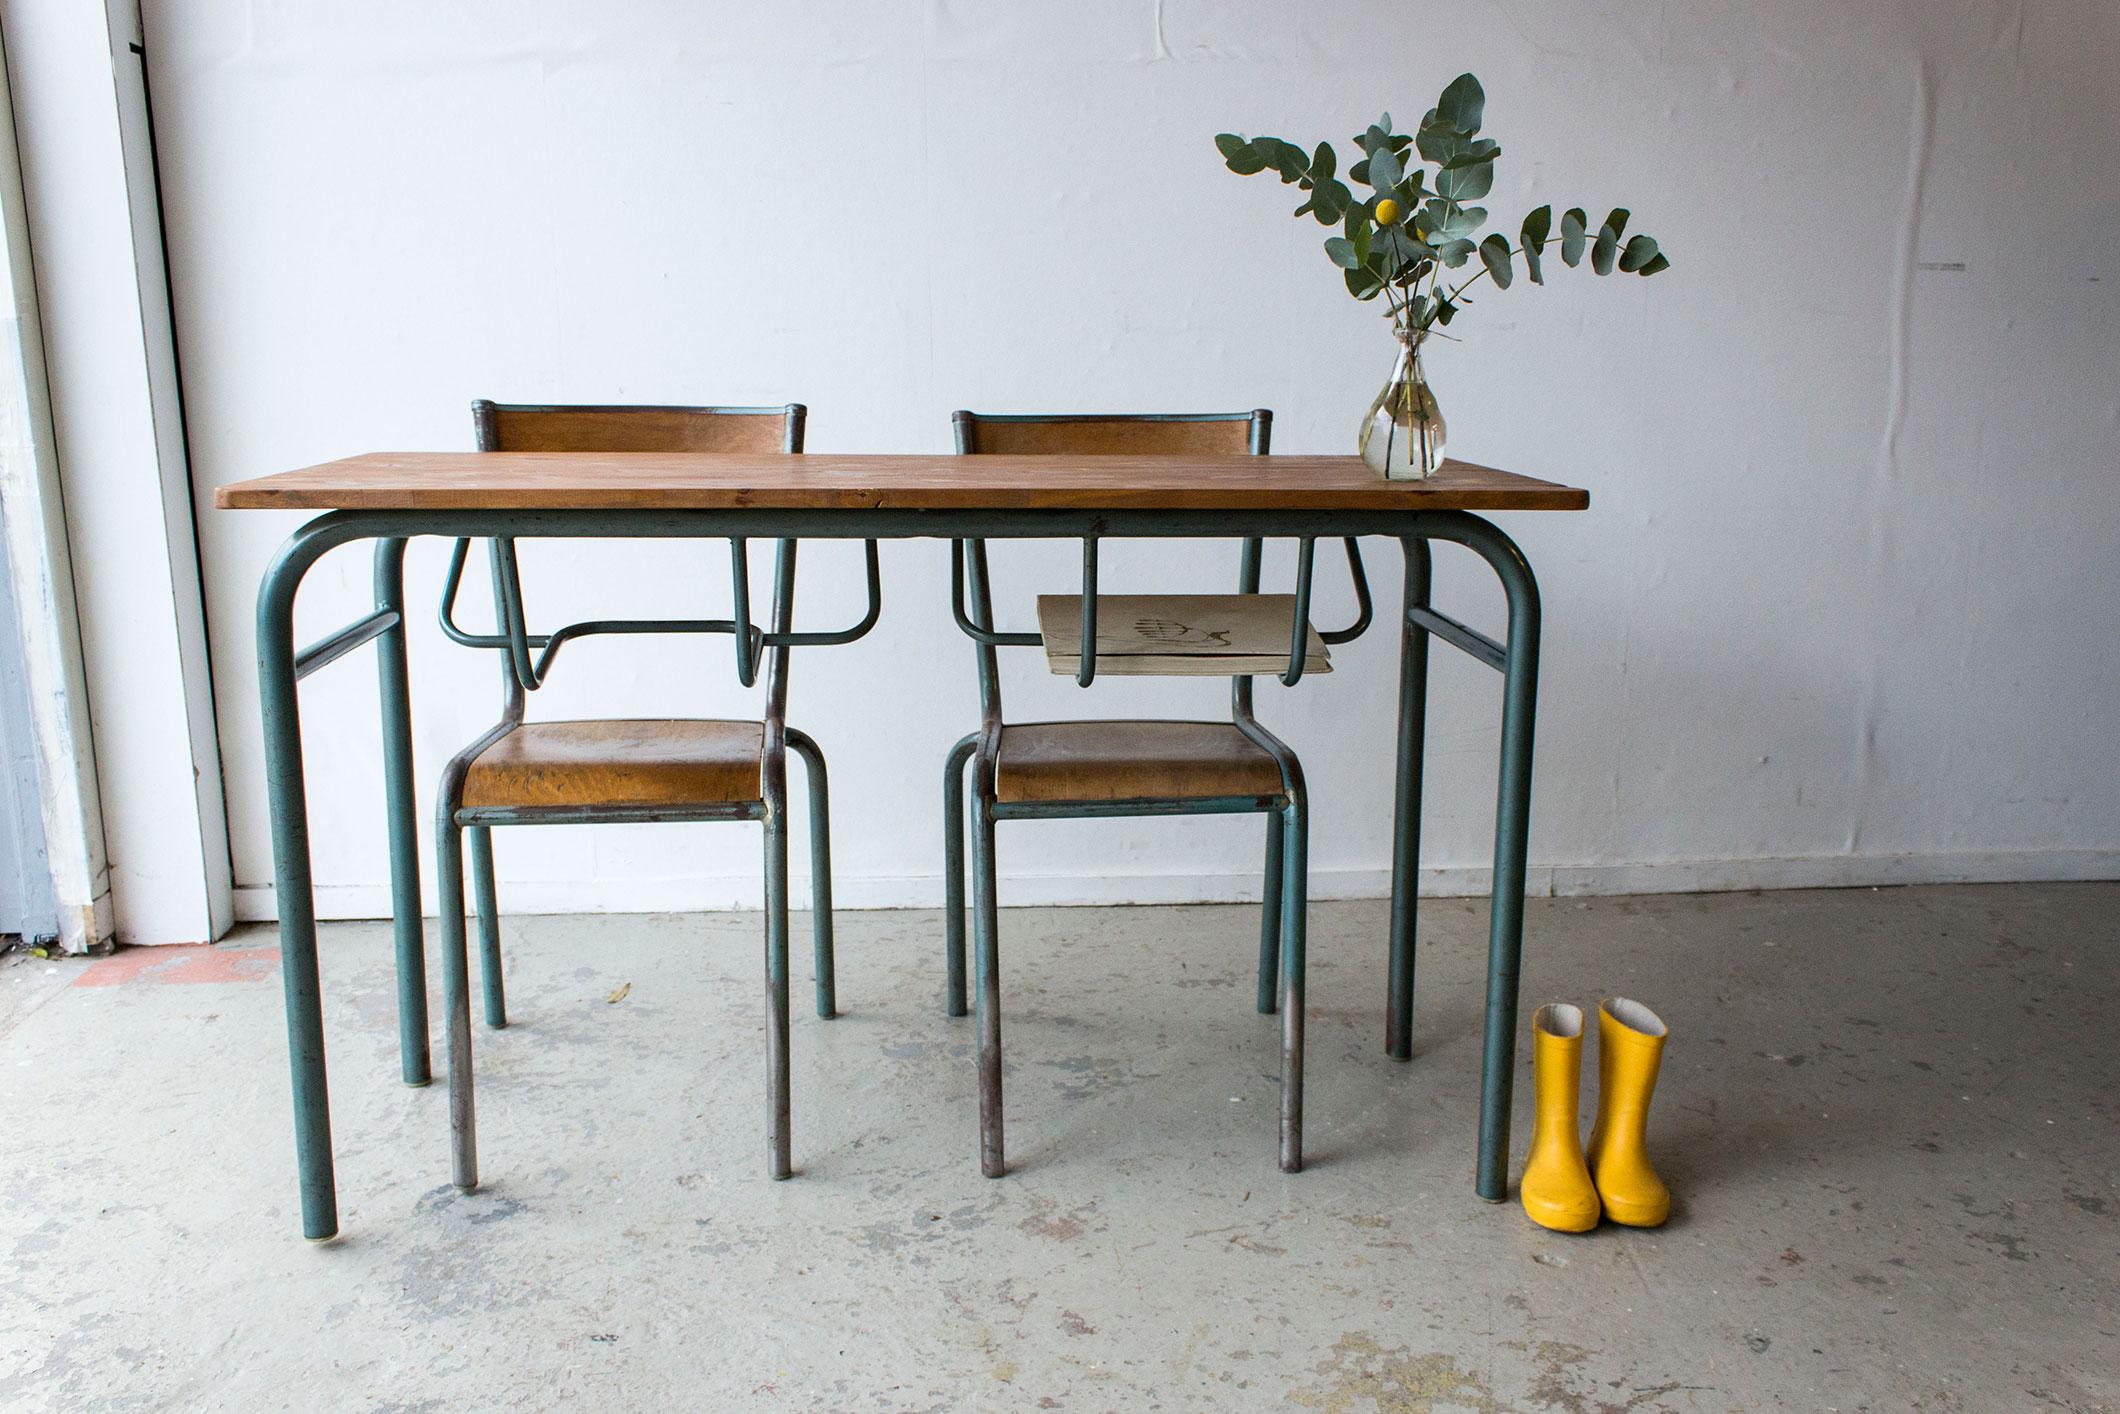 3170---vintage-schooltafel-grijsgroen-frame---Firma-zoethout_5.jpg